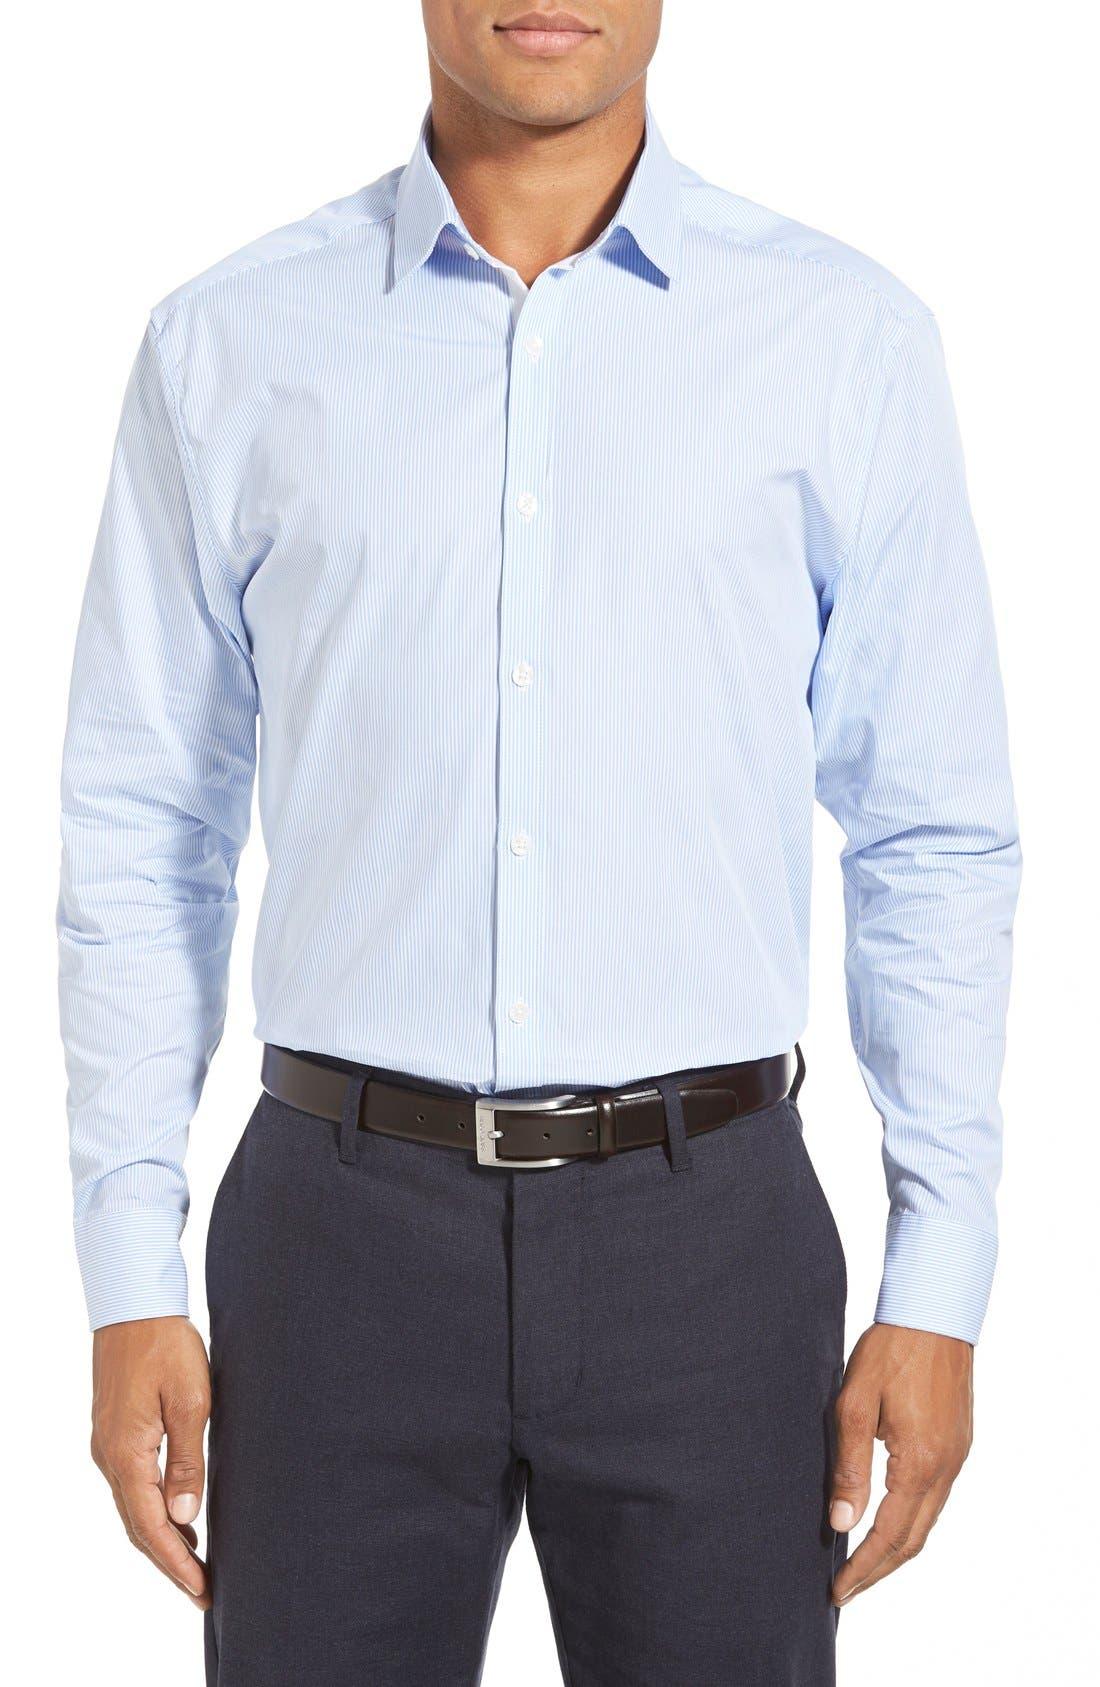 Alternate Image 2  - Calibrate Extra Trim Fit Non-Iron Microcheck Dress Shirt